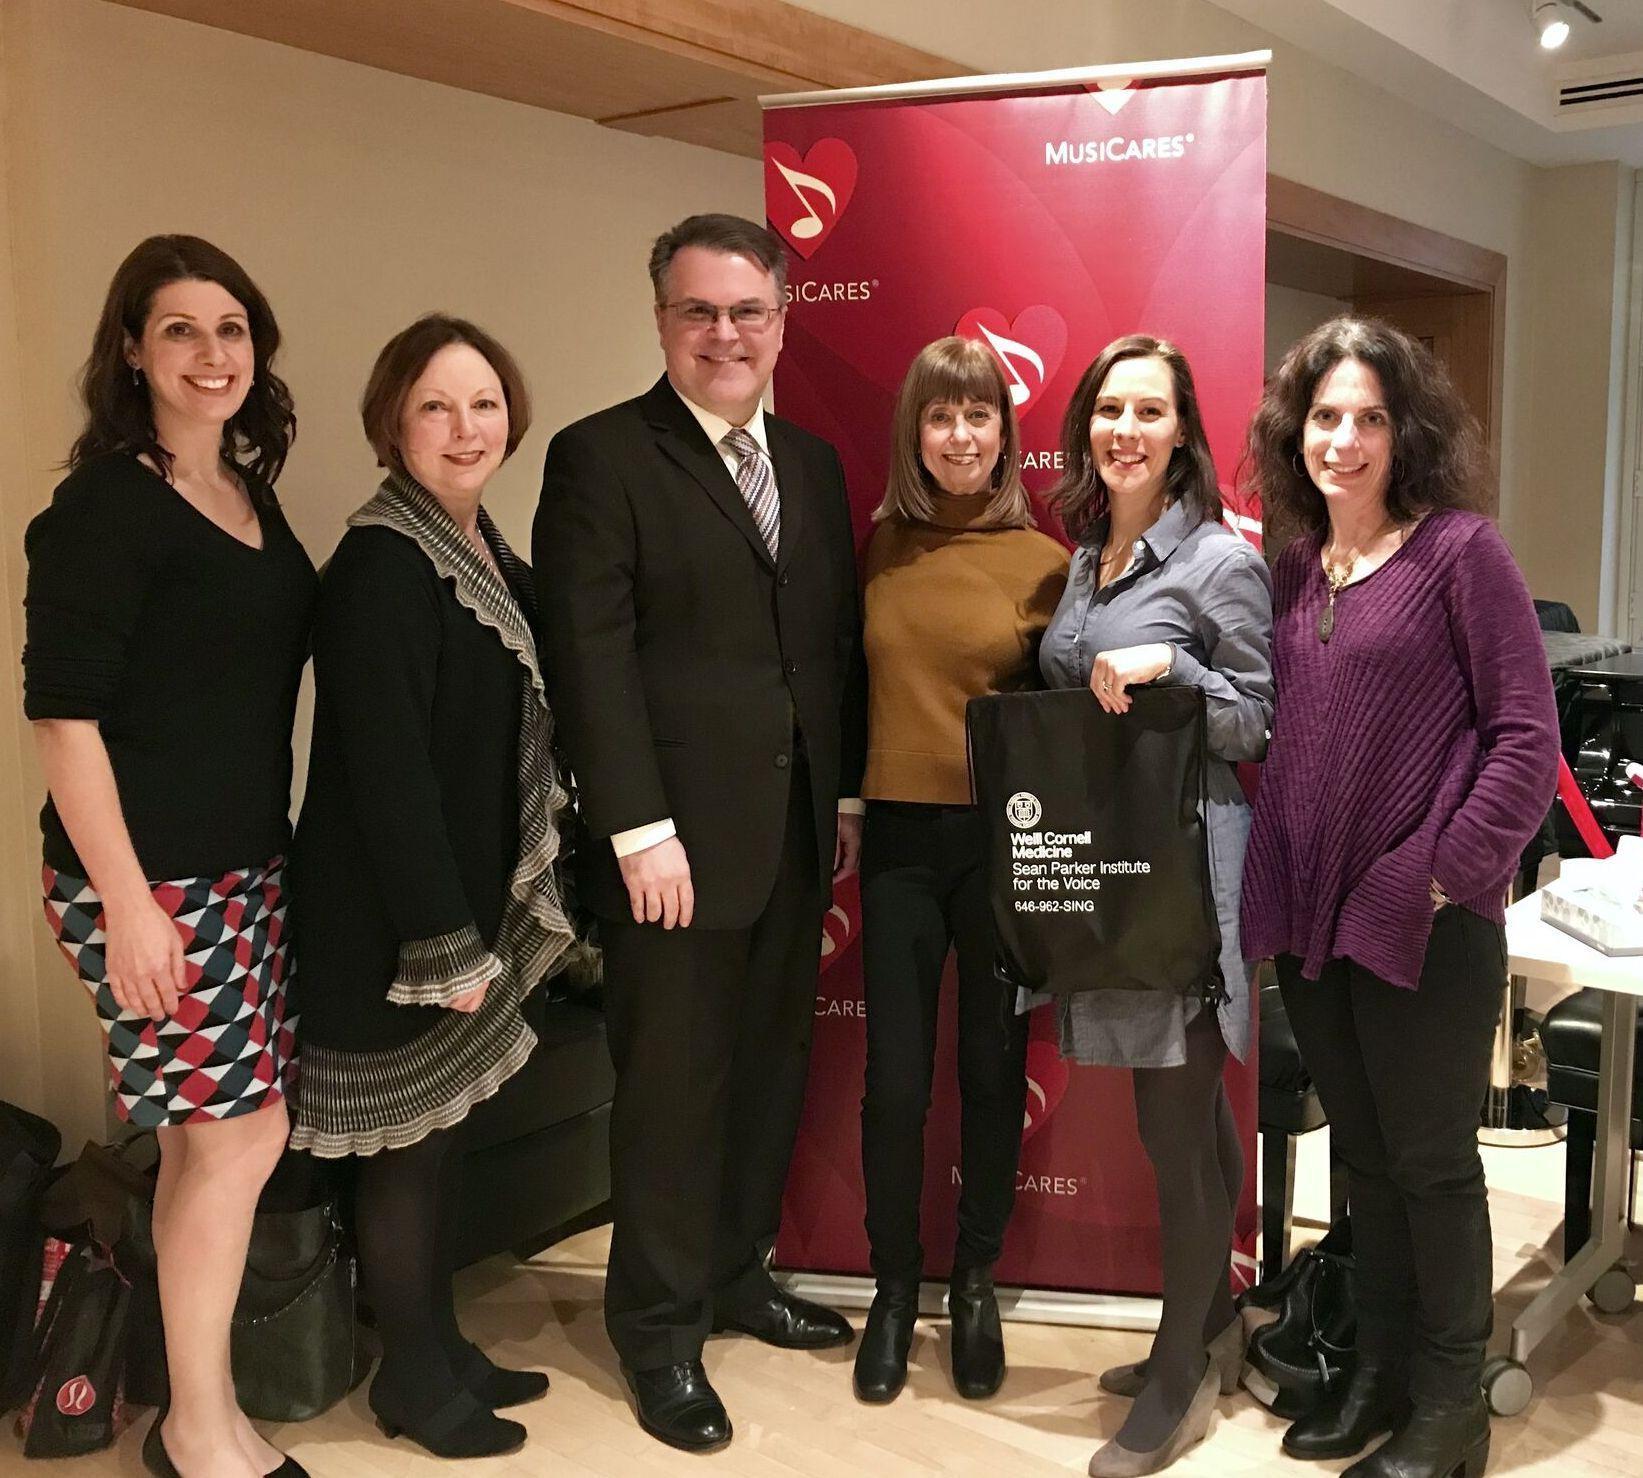 Speech therapists Christine Estes, Chandler Thompson, Dr. Lucian Sulica, Rachel Coleman and Jennifer Leff, Senior Director, MusiCares